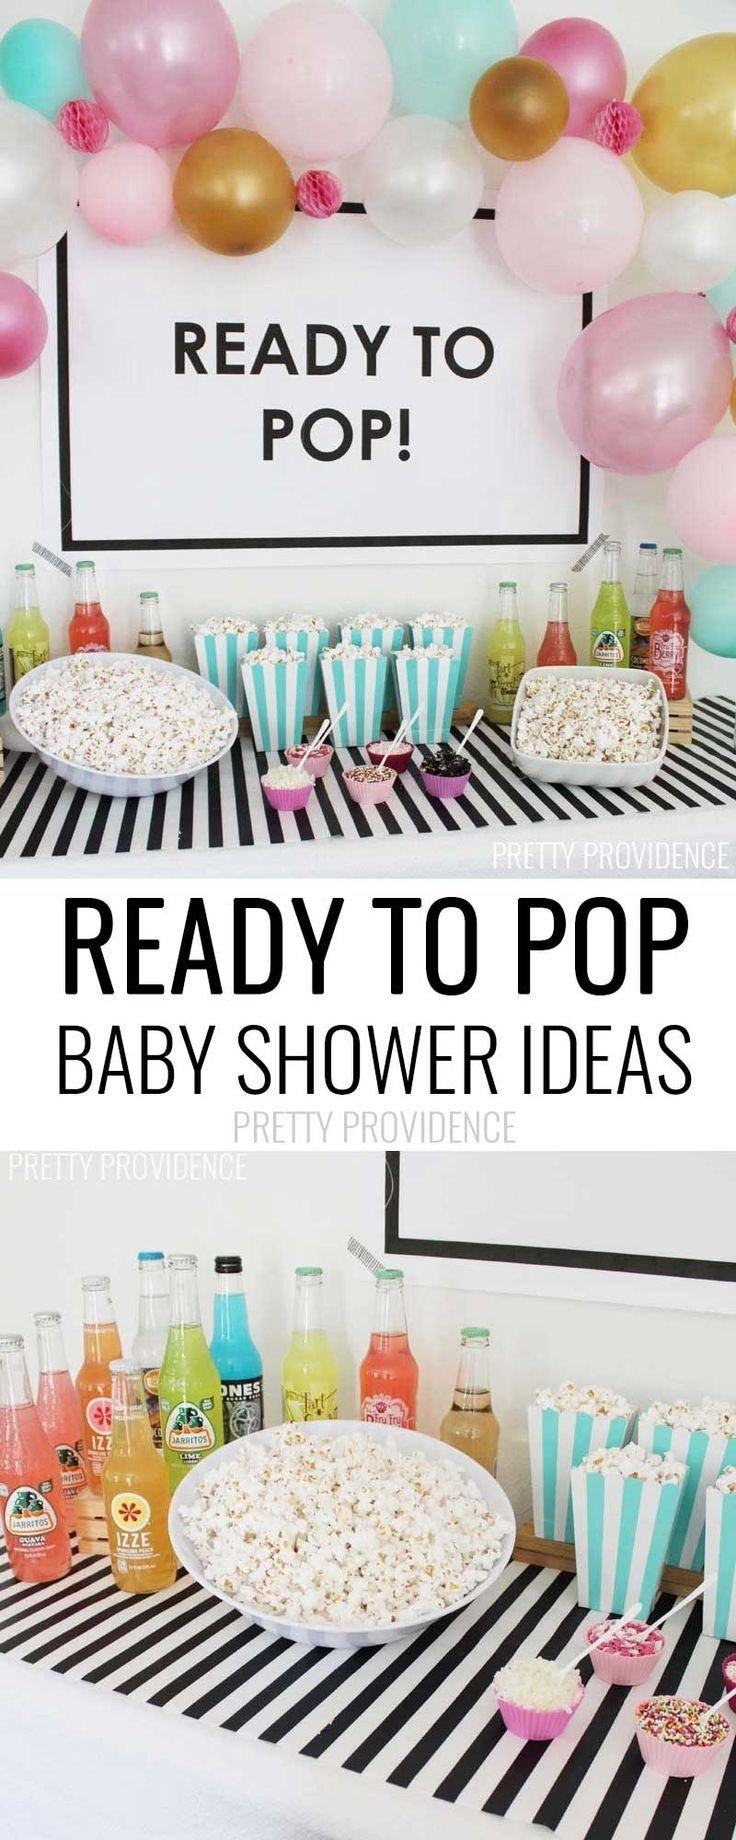 10 Ideal Baby Shower Ideas On Pinterest incredible ideas best baby shower themes homely idea 25 on pinterest